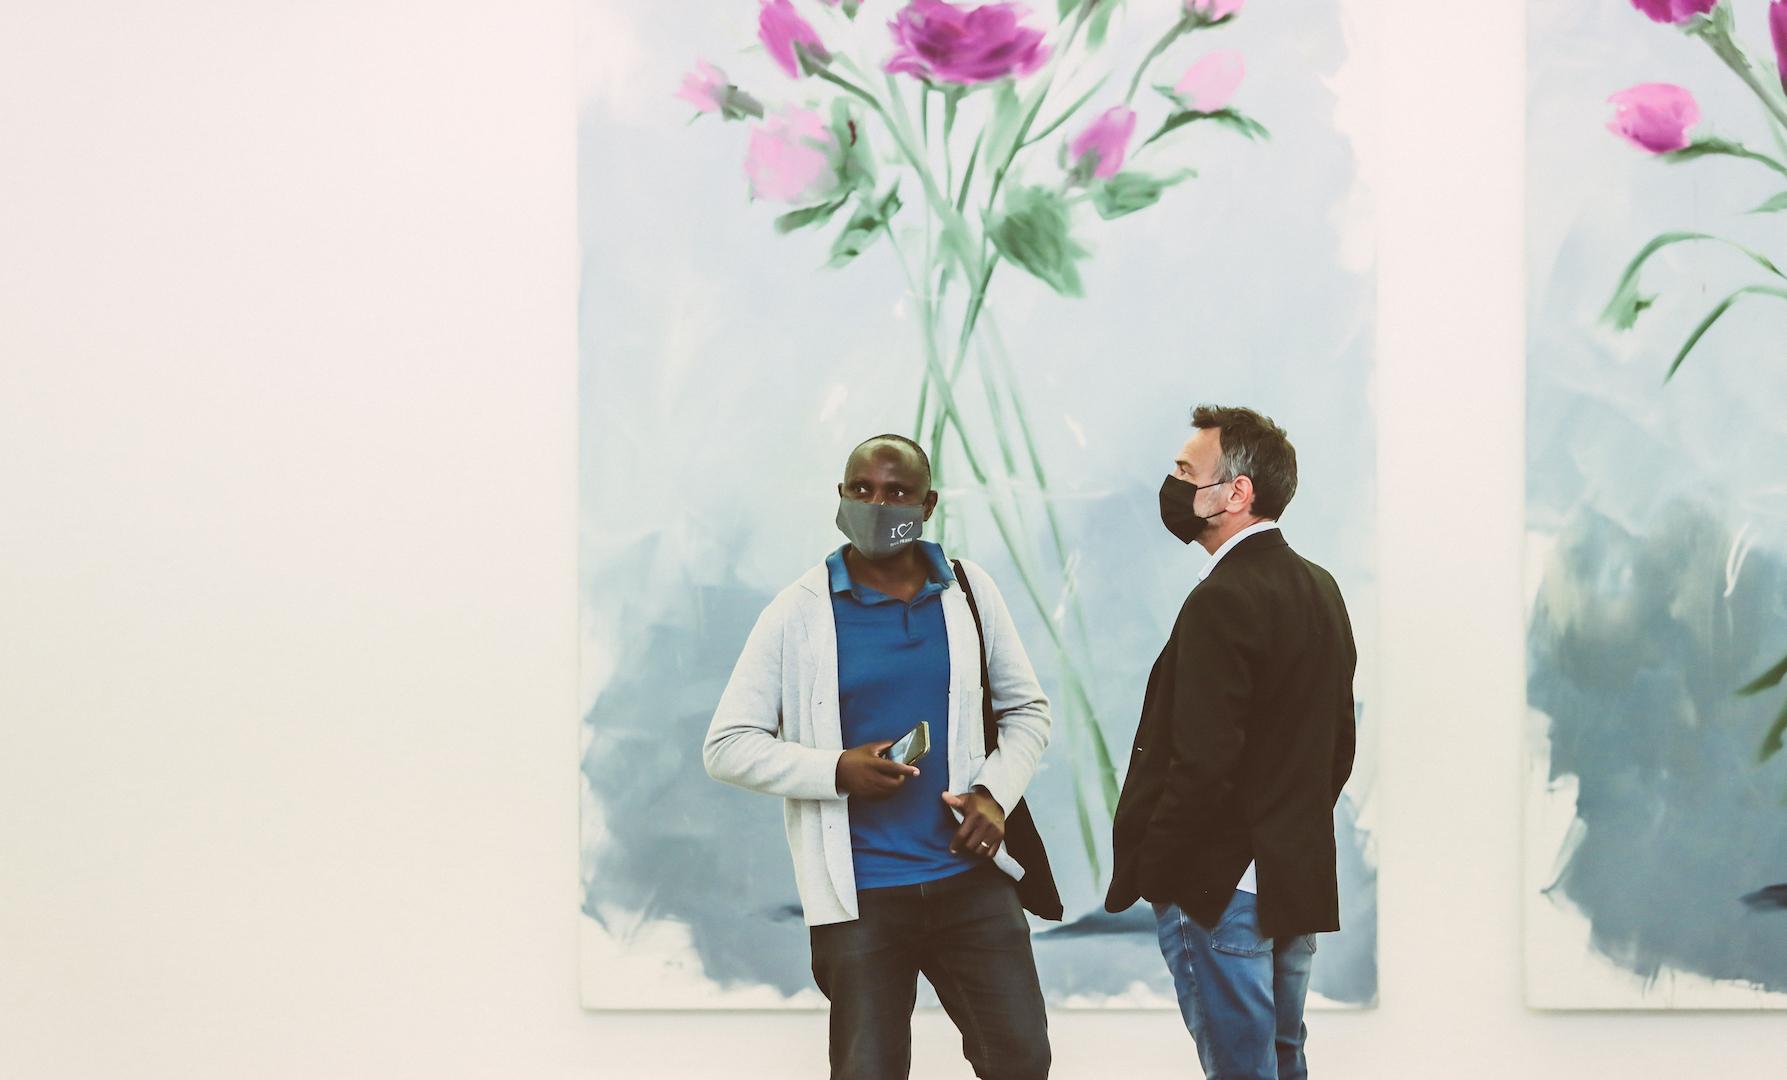 Gregory Forstner 'Des fleurs pour les audacieux' 2021 at FRAC, Montpellier Opening Event